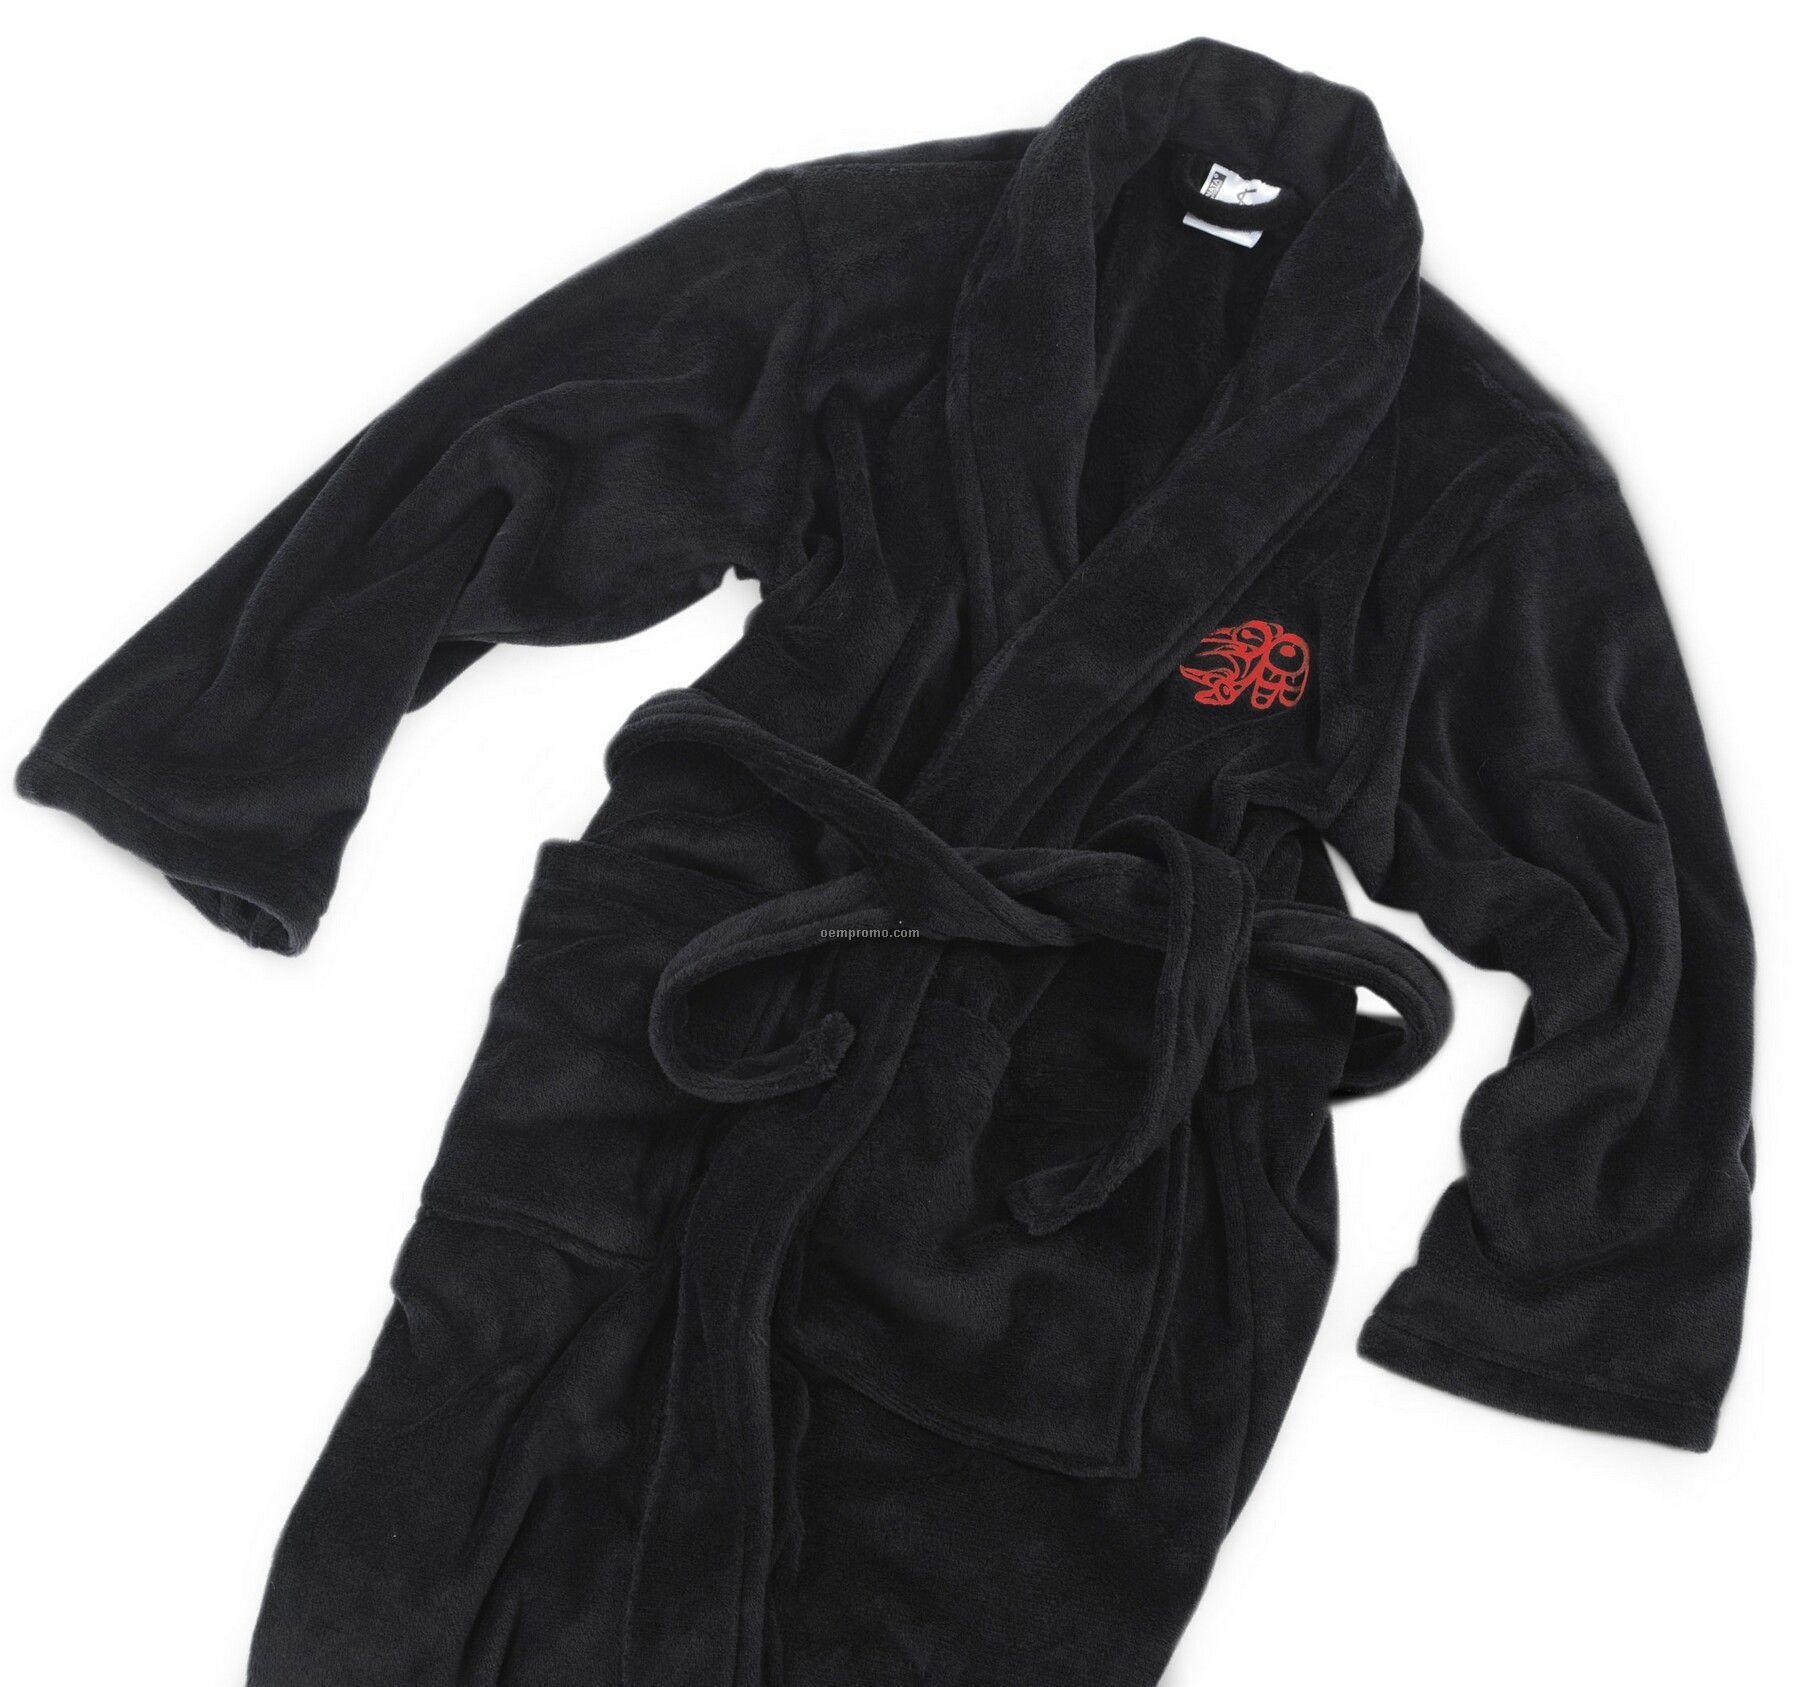 Black Velura Robe (S-m)